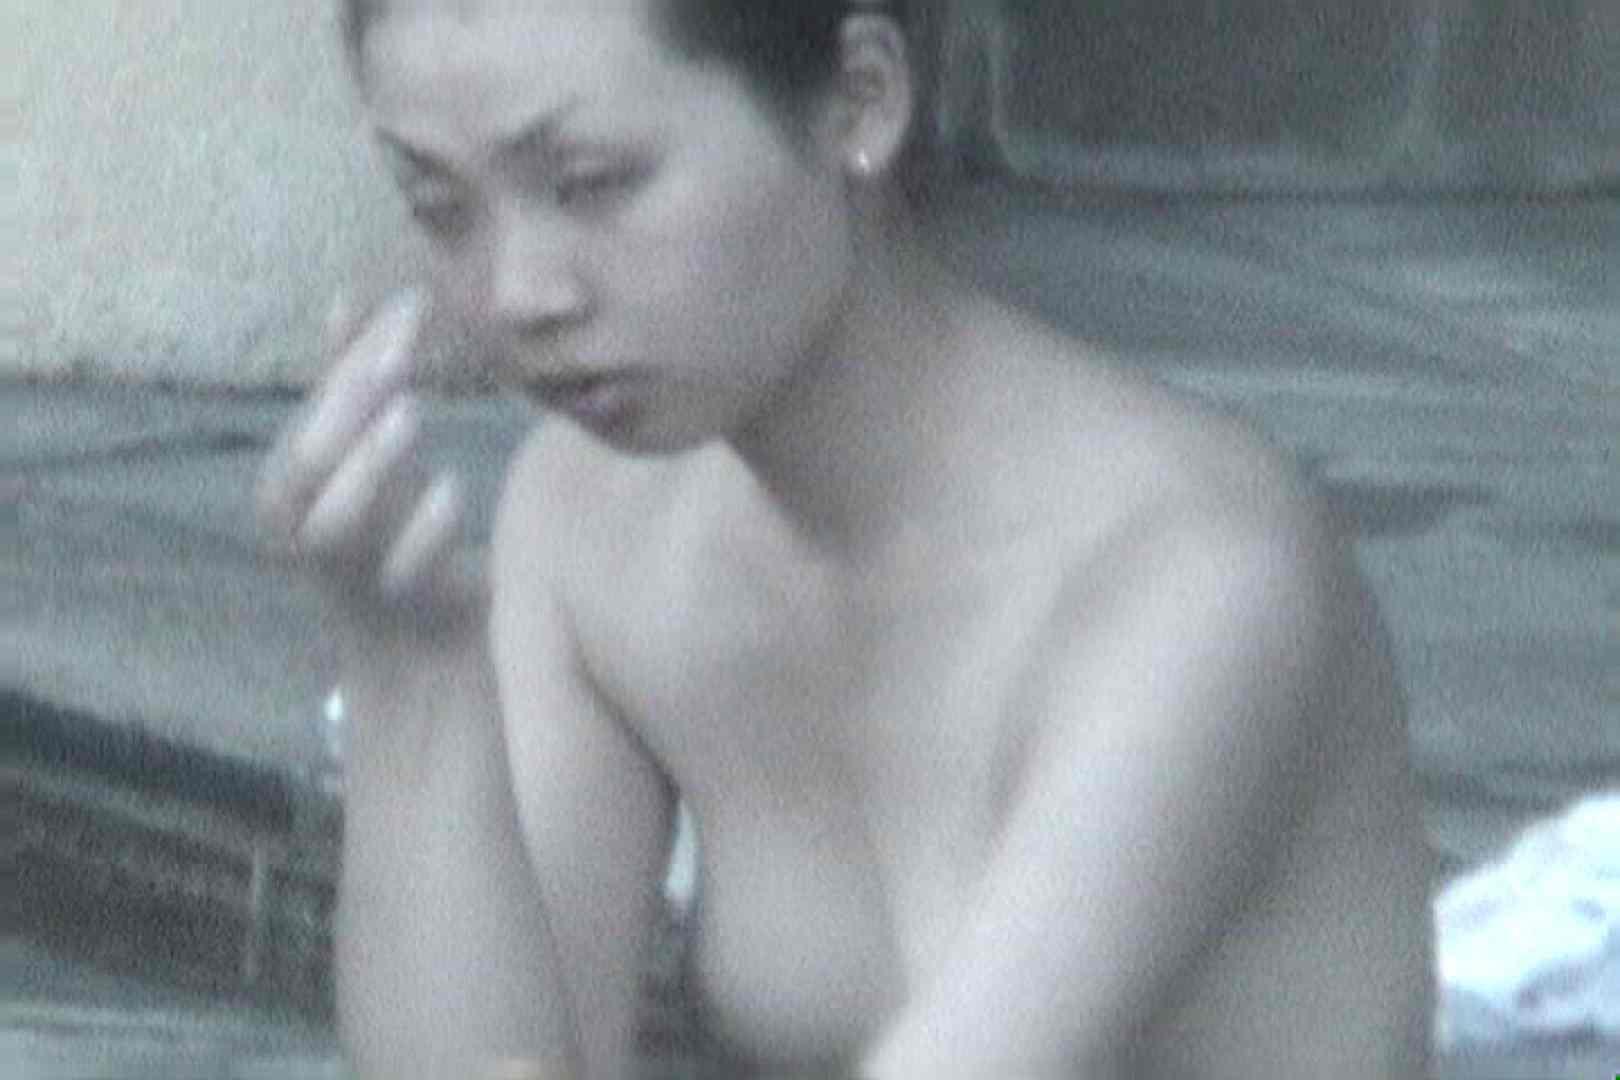 Aquaな露天風呂Vol.643 露天 オメコ無修正動画無料 105pic 39